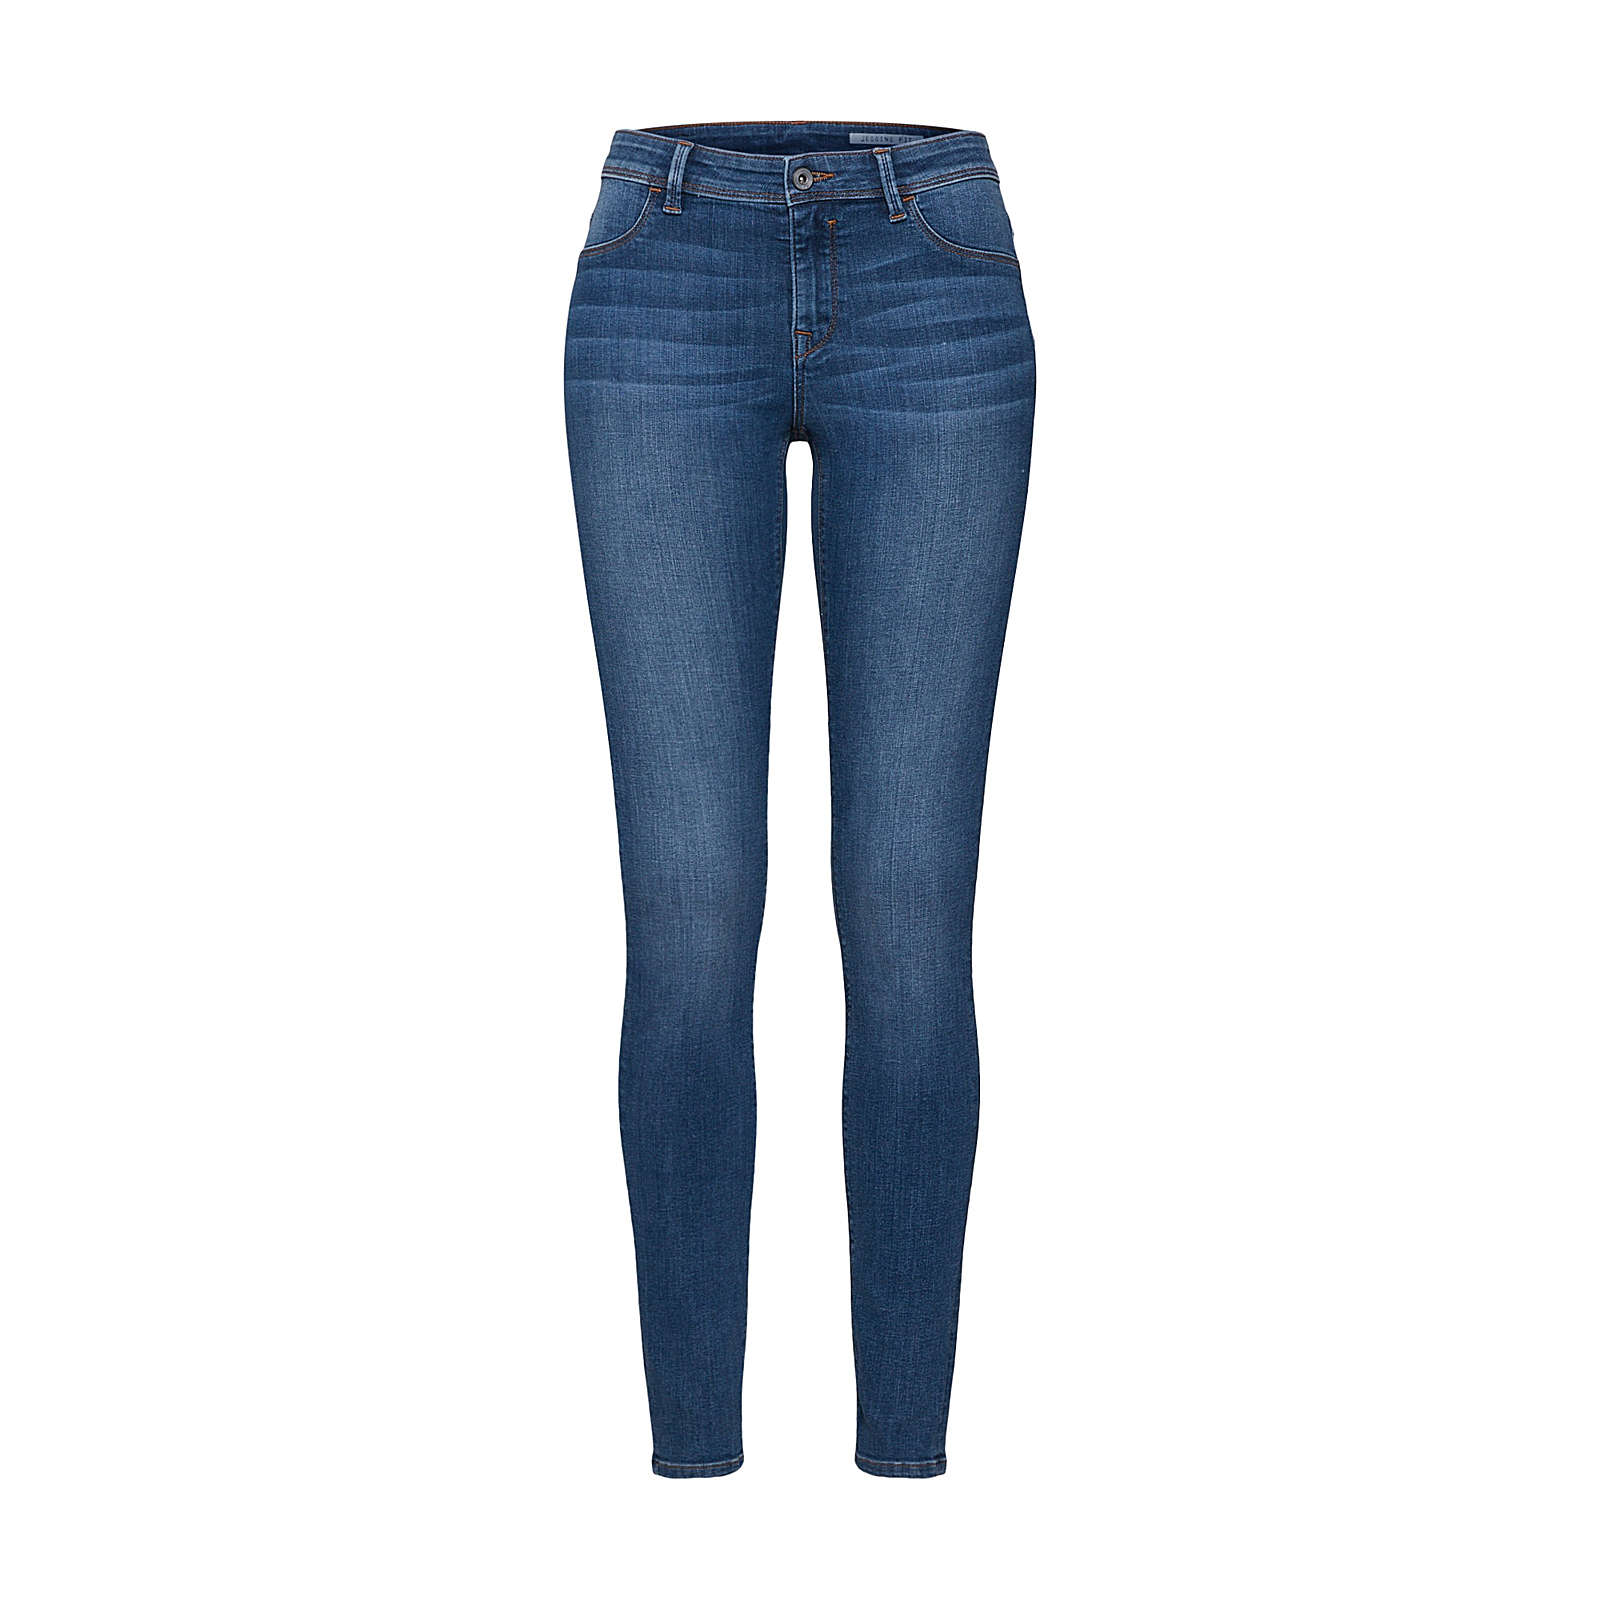 EDC BY ESPRIT Jeans Jeggings blue denim Damen Gr. W28/L32